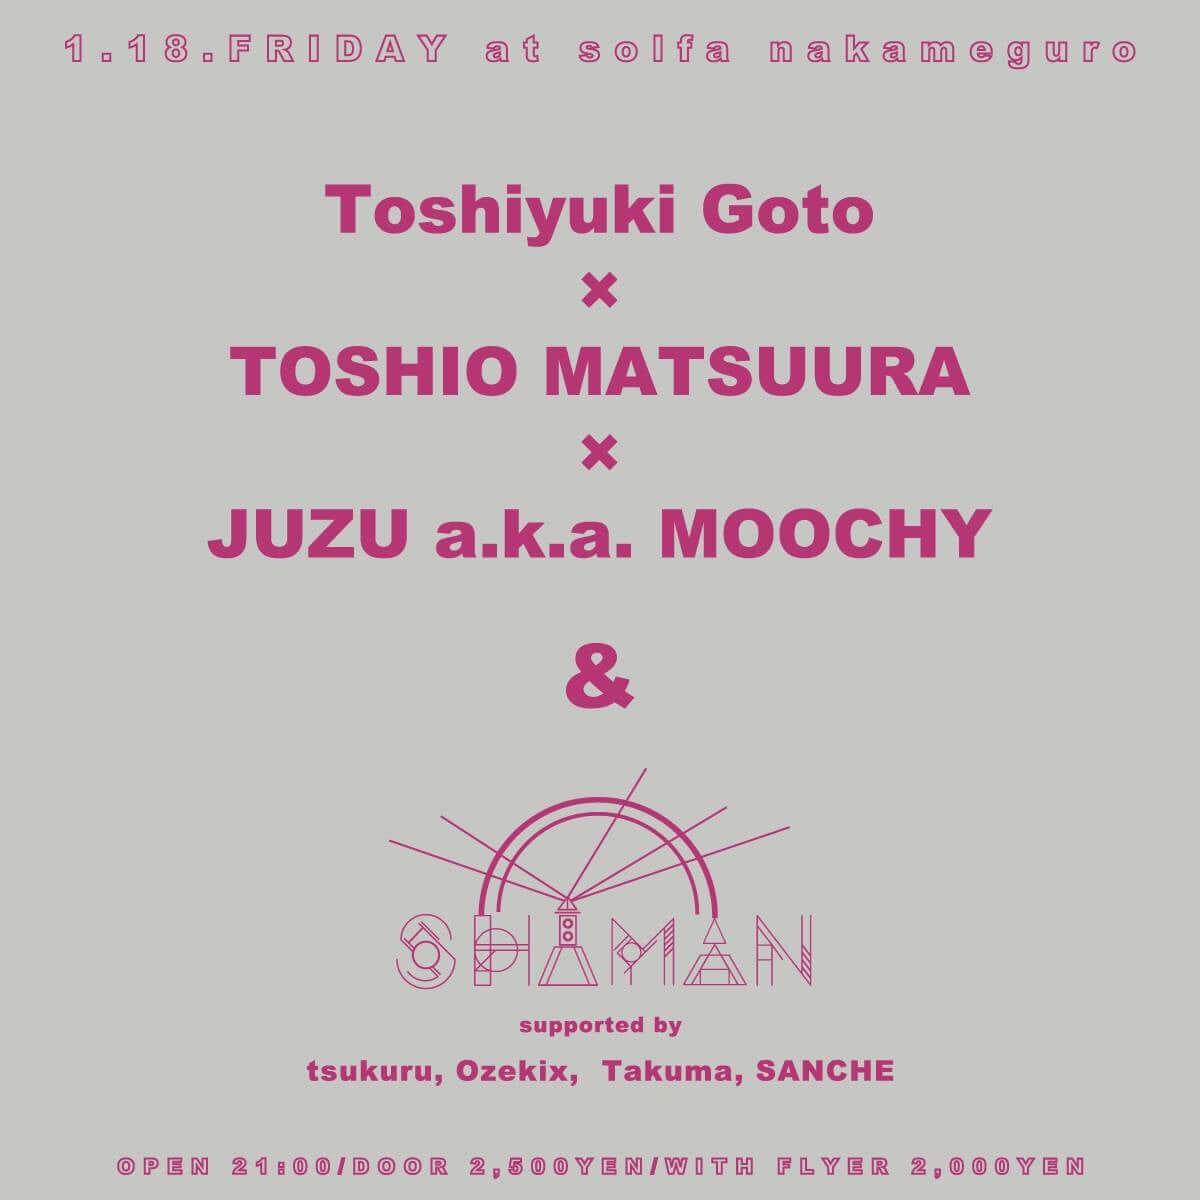 Toshiyuki Goto、TOSHIO MATSUURA、JUZU a.k.a. MOOCHYがパーティー「Colors」を中目黒solfaにて開催 music190116-solfa-colors-2-1200x1200